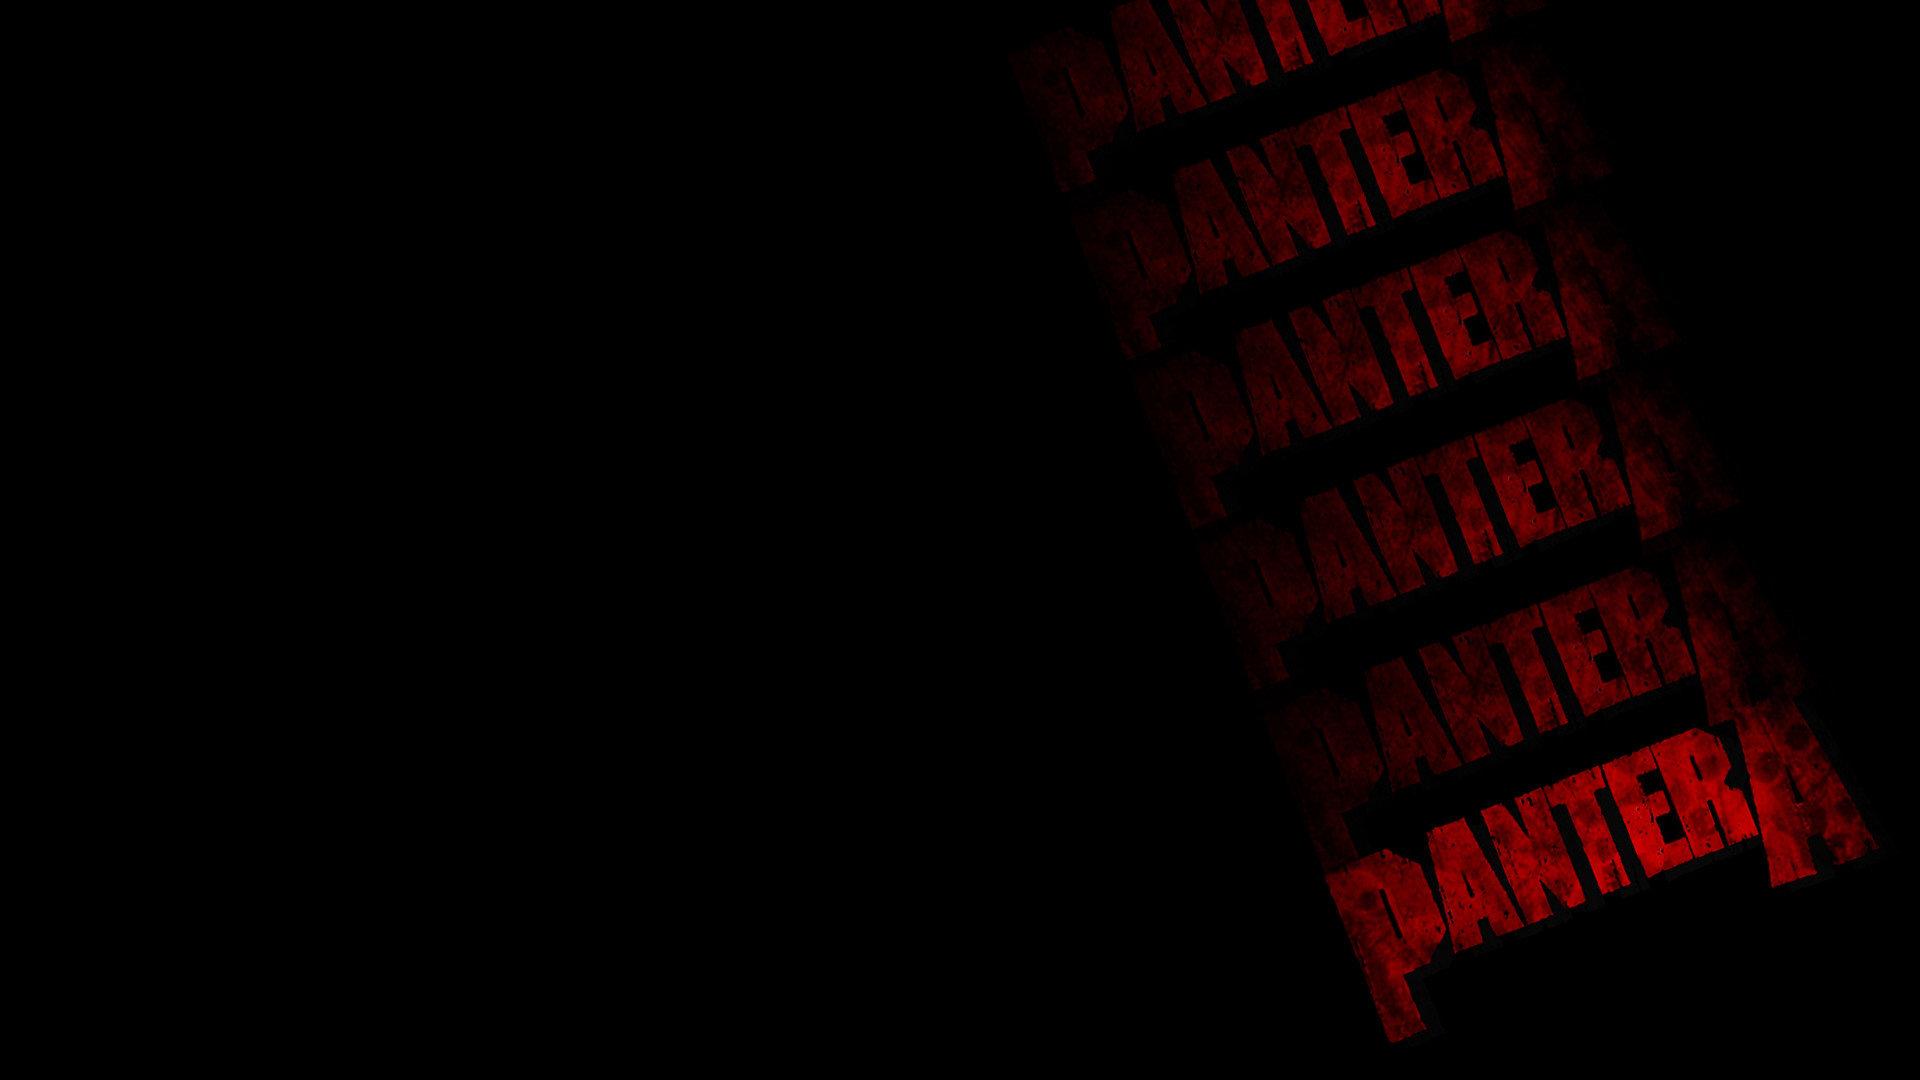 High Resolution Pantera Full Hd 1920x1080 Wallpaper ID146147 For Desktop